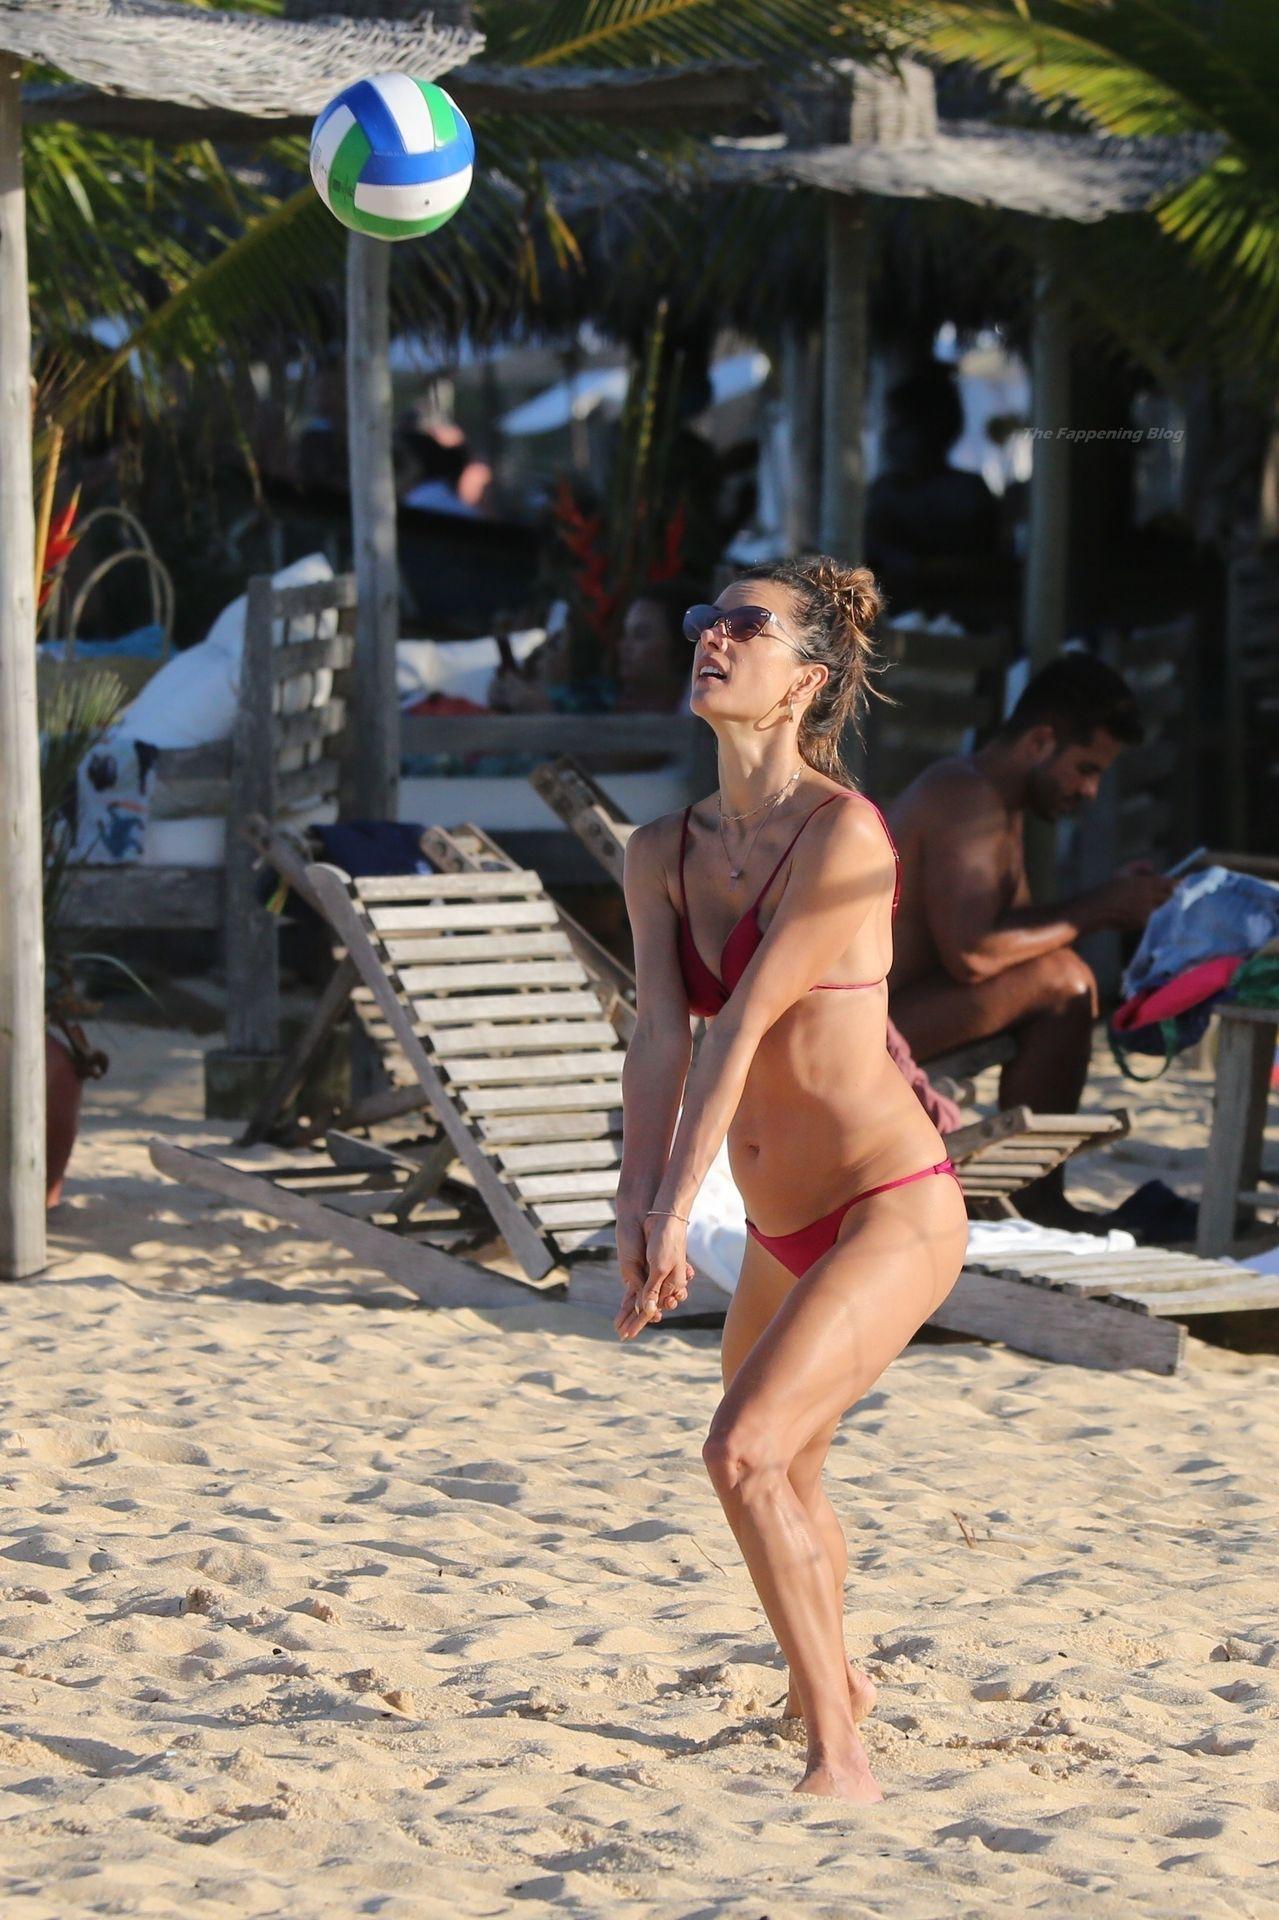 Alessandra-Ambrosio-Sexy-35-thefappeningblog.com_-1.jpg